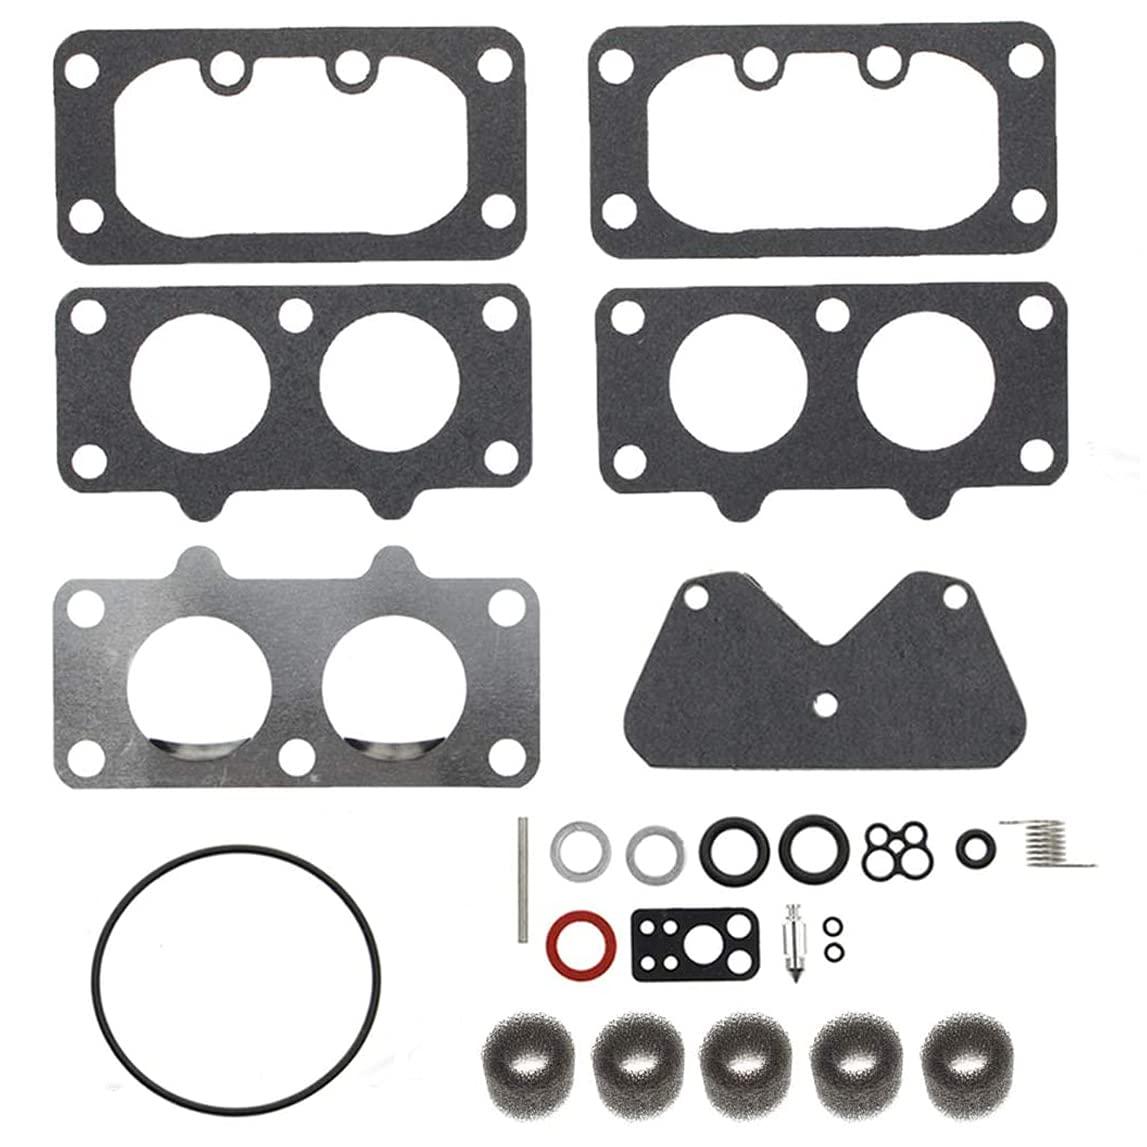 AUTOKAY Phoenix Mall Carburetor Overhaul Selling Carb Rebuild 406777 407777 40577 Kit